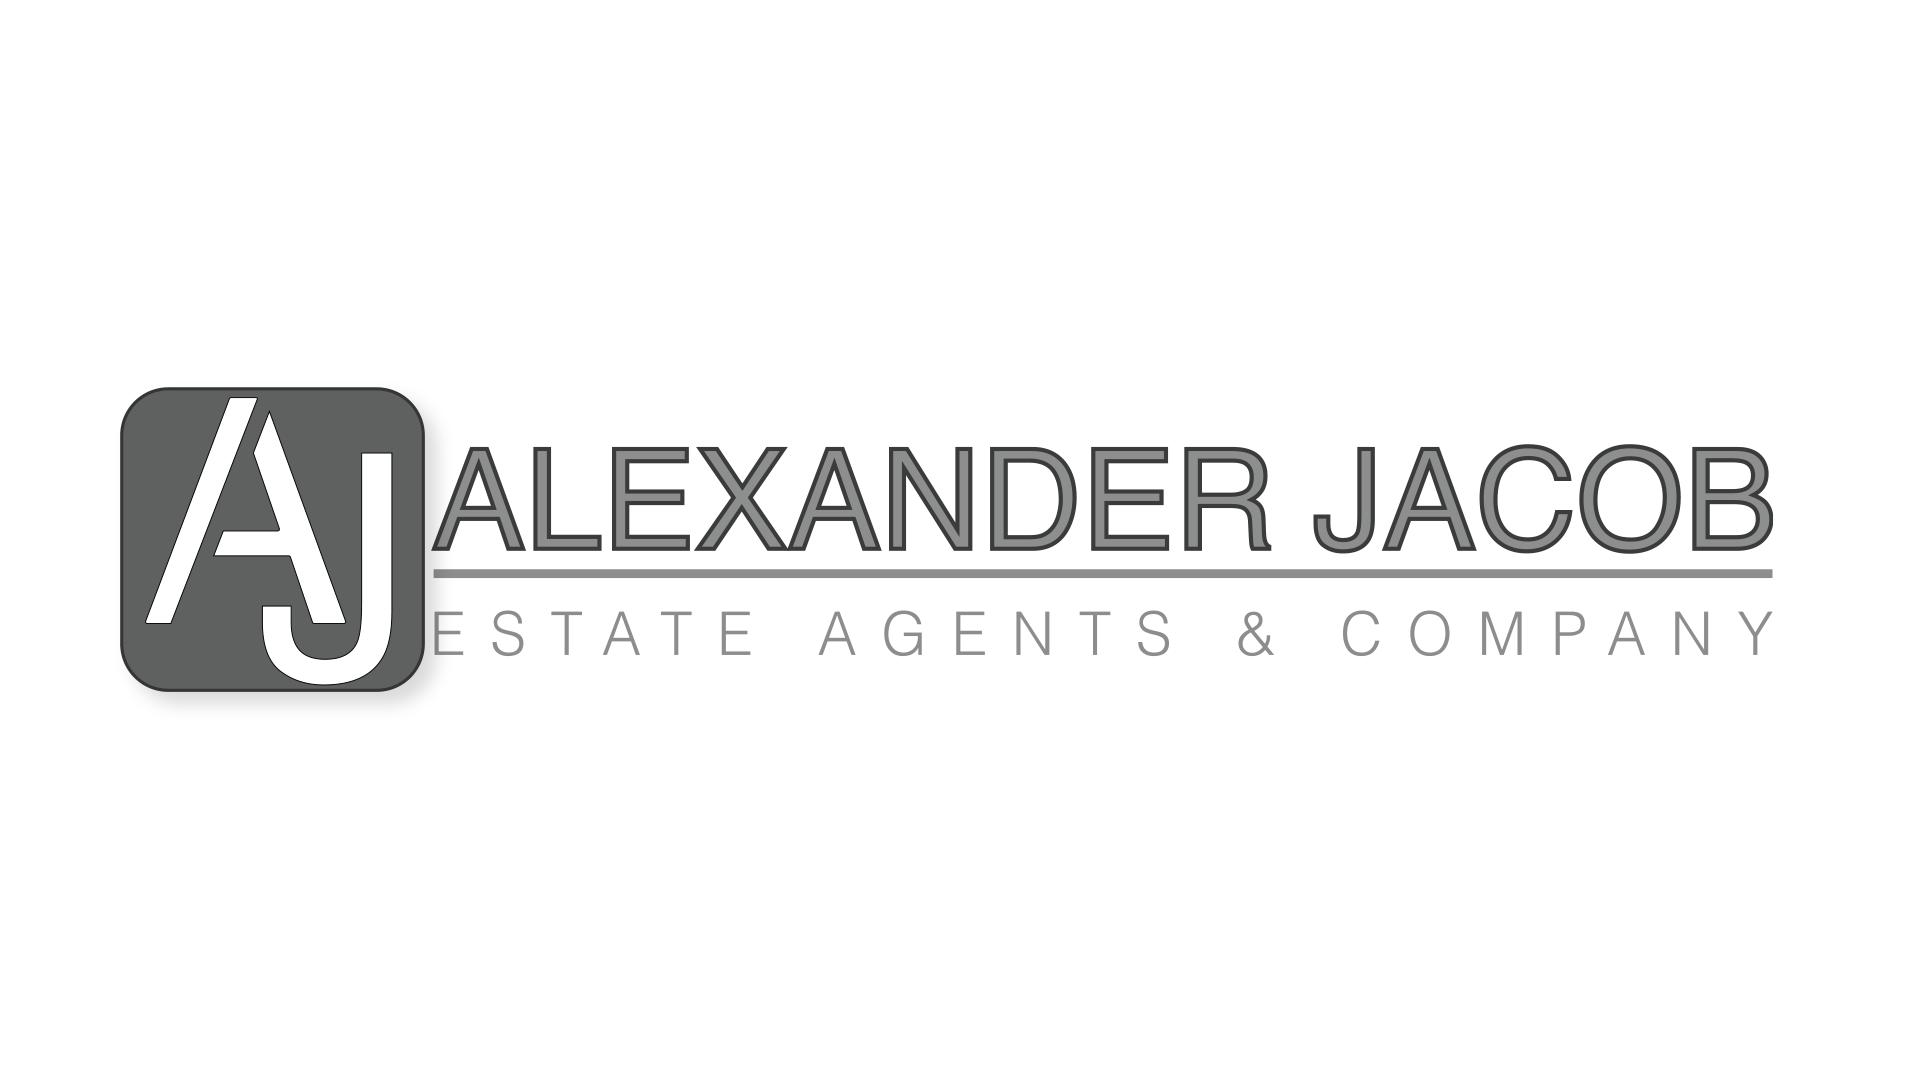 Alexander Jacob Estate Agents & Company